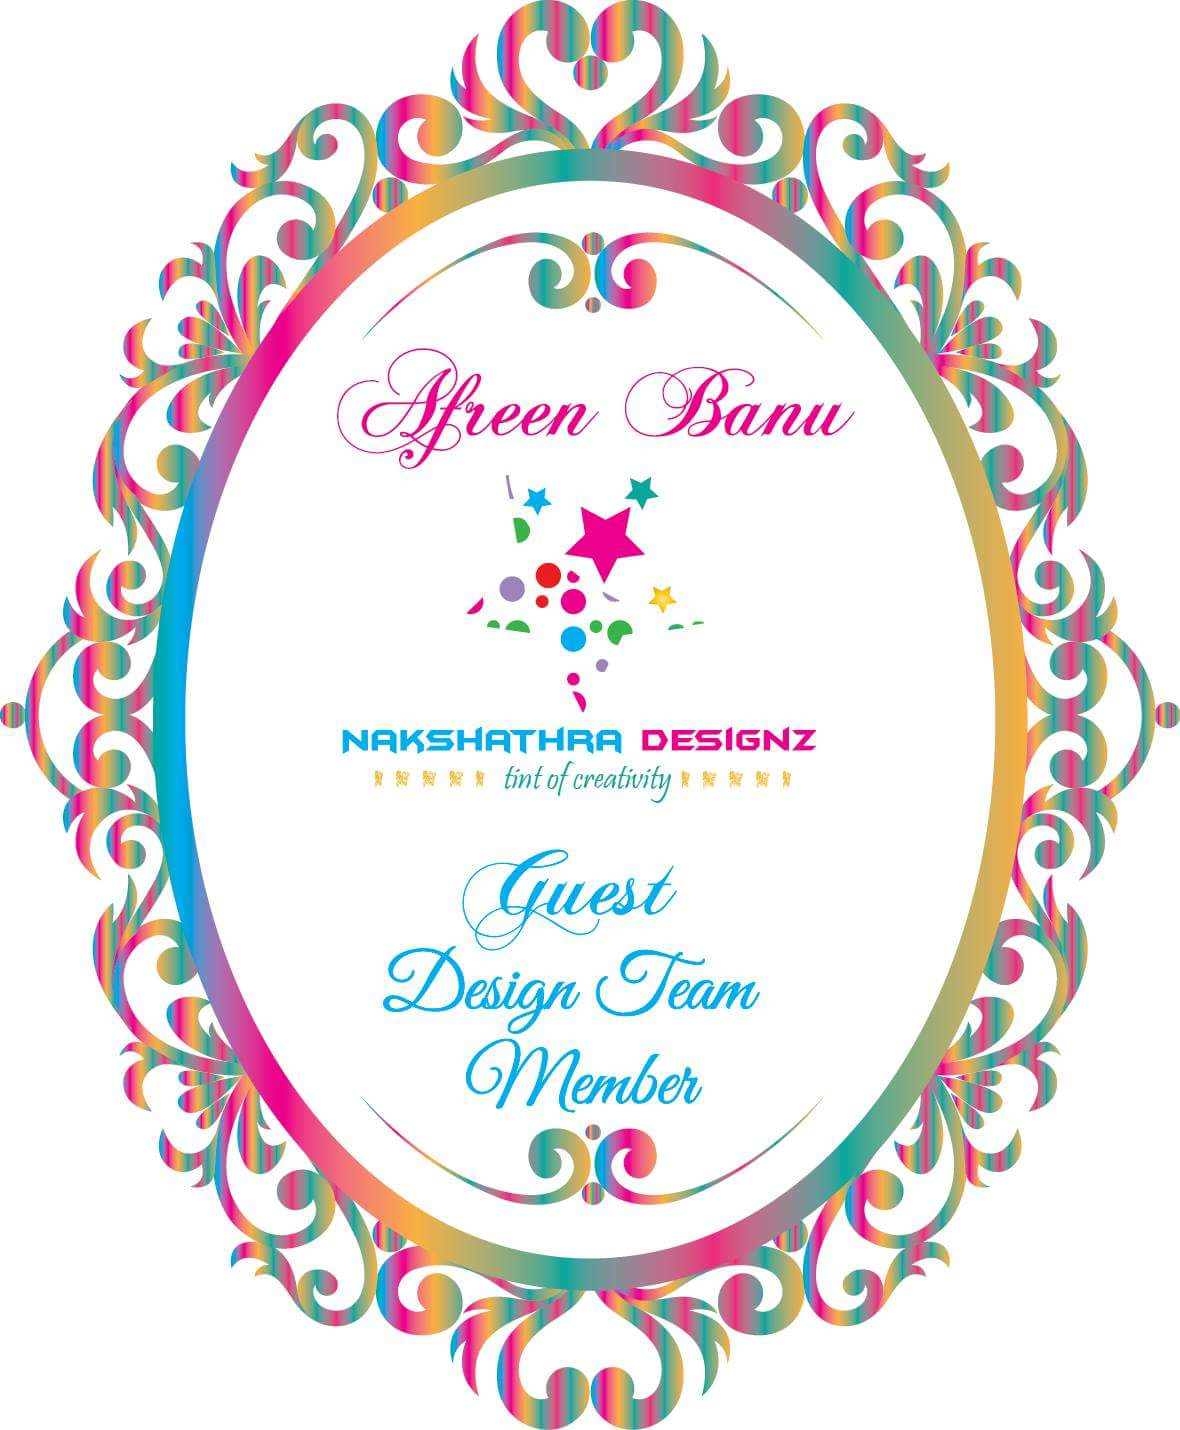 Guest Designer at Nakshathradesignz